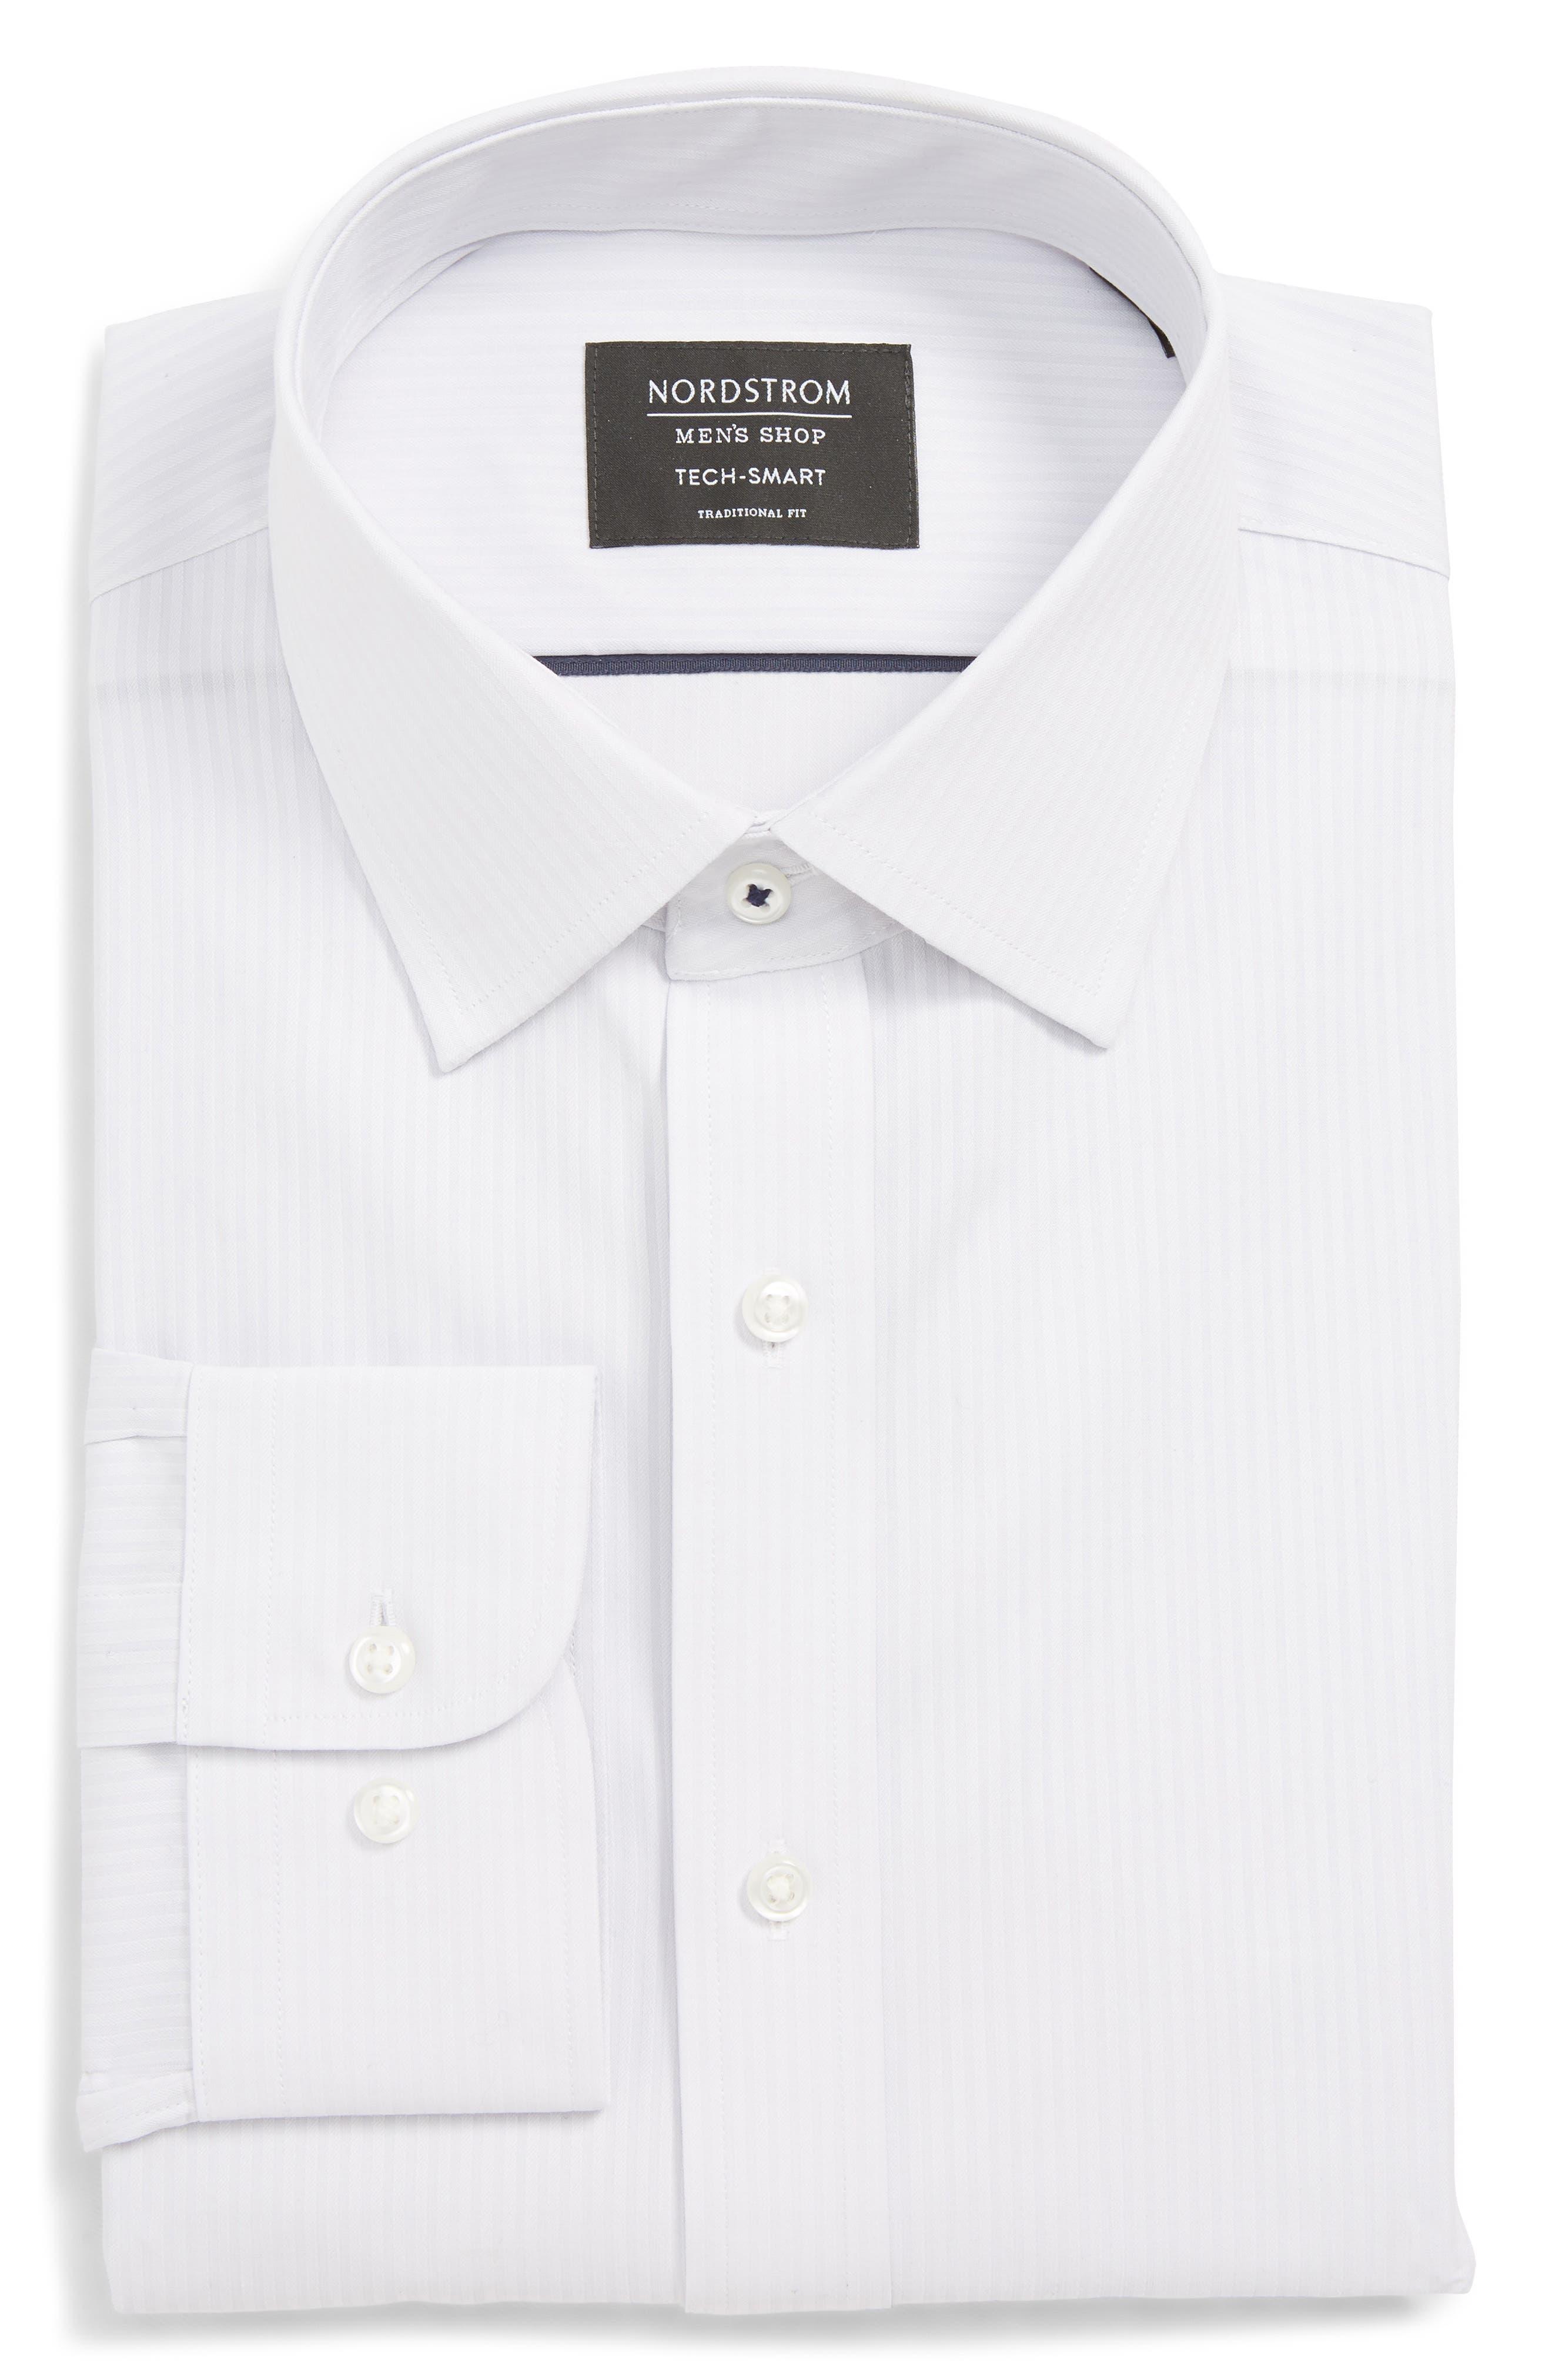 Tech-Smart Traditional Fit Stretch Stripe Dress Shirt,                             Main thumbnail 1, color,                             GREY MICRO